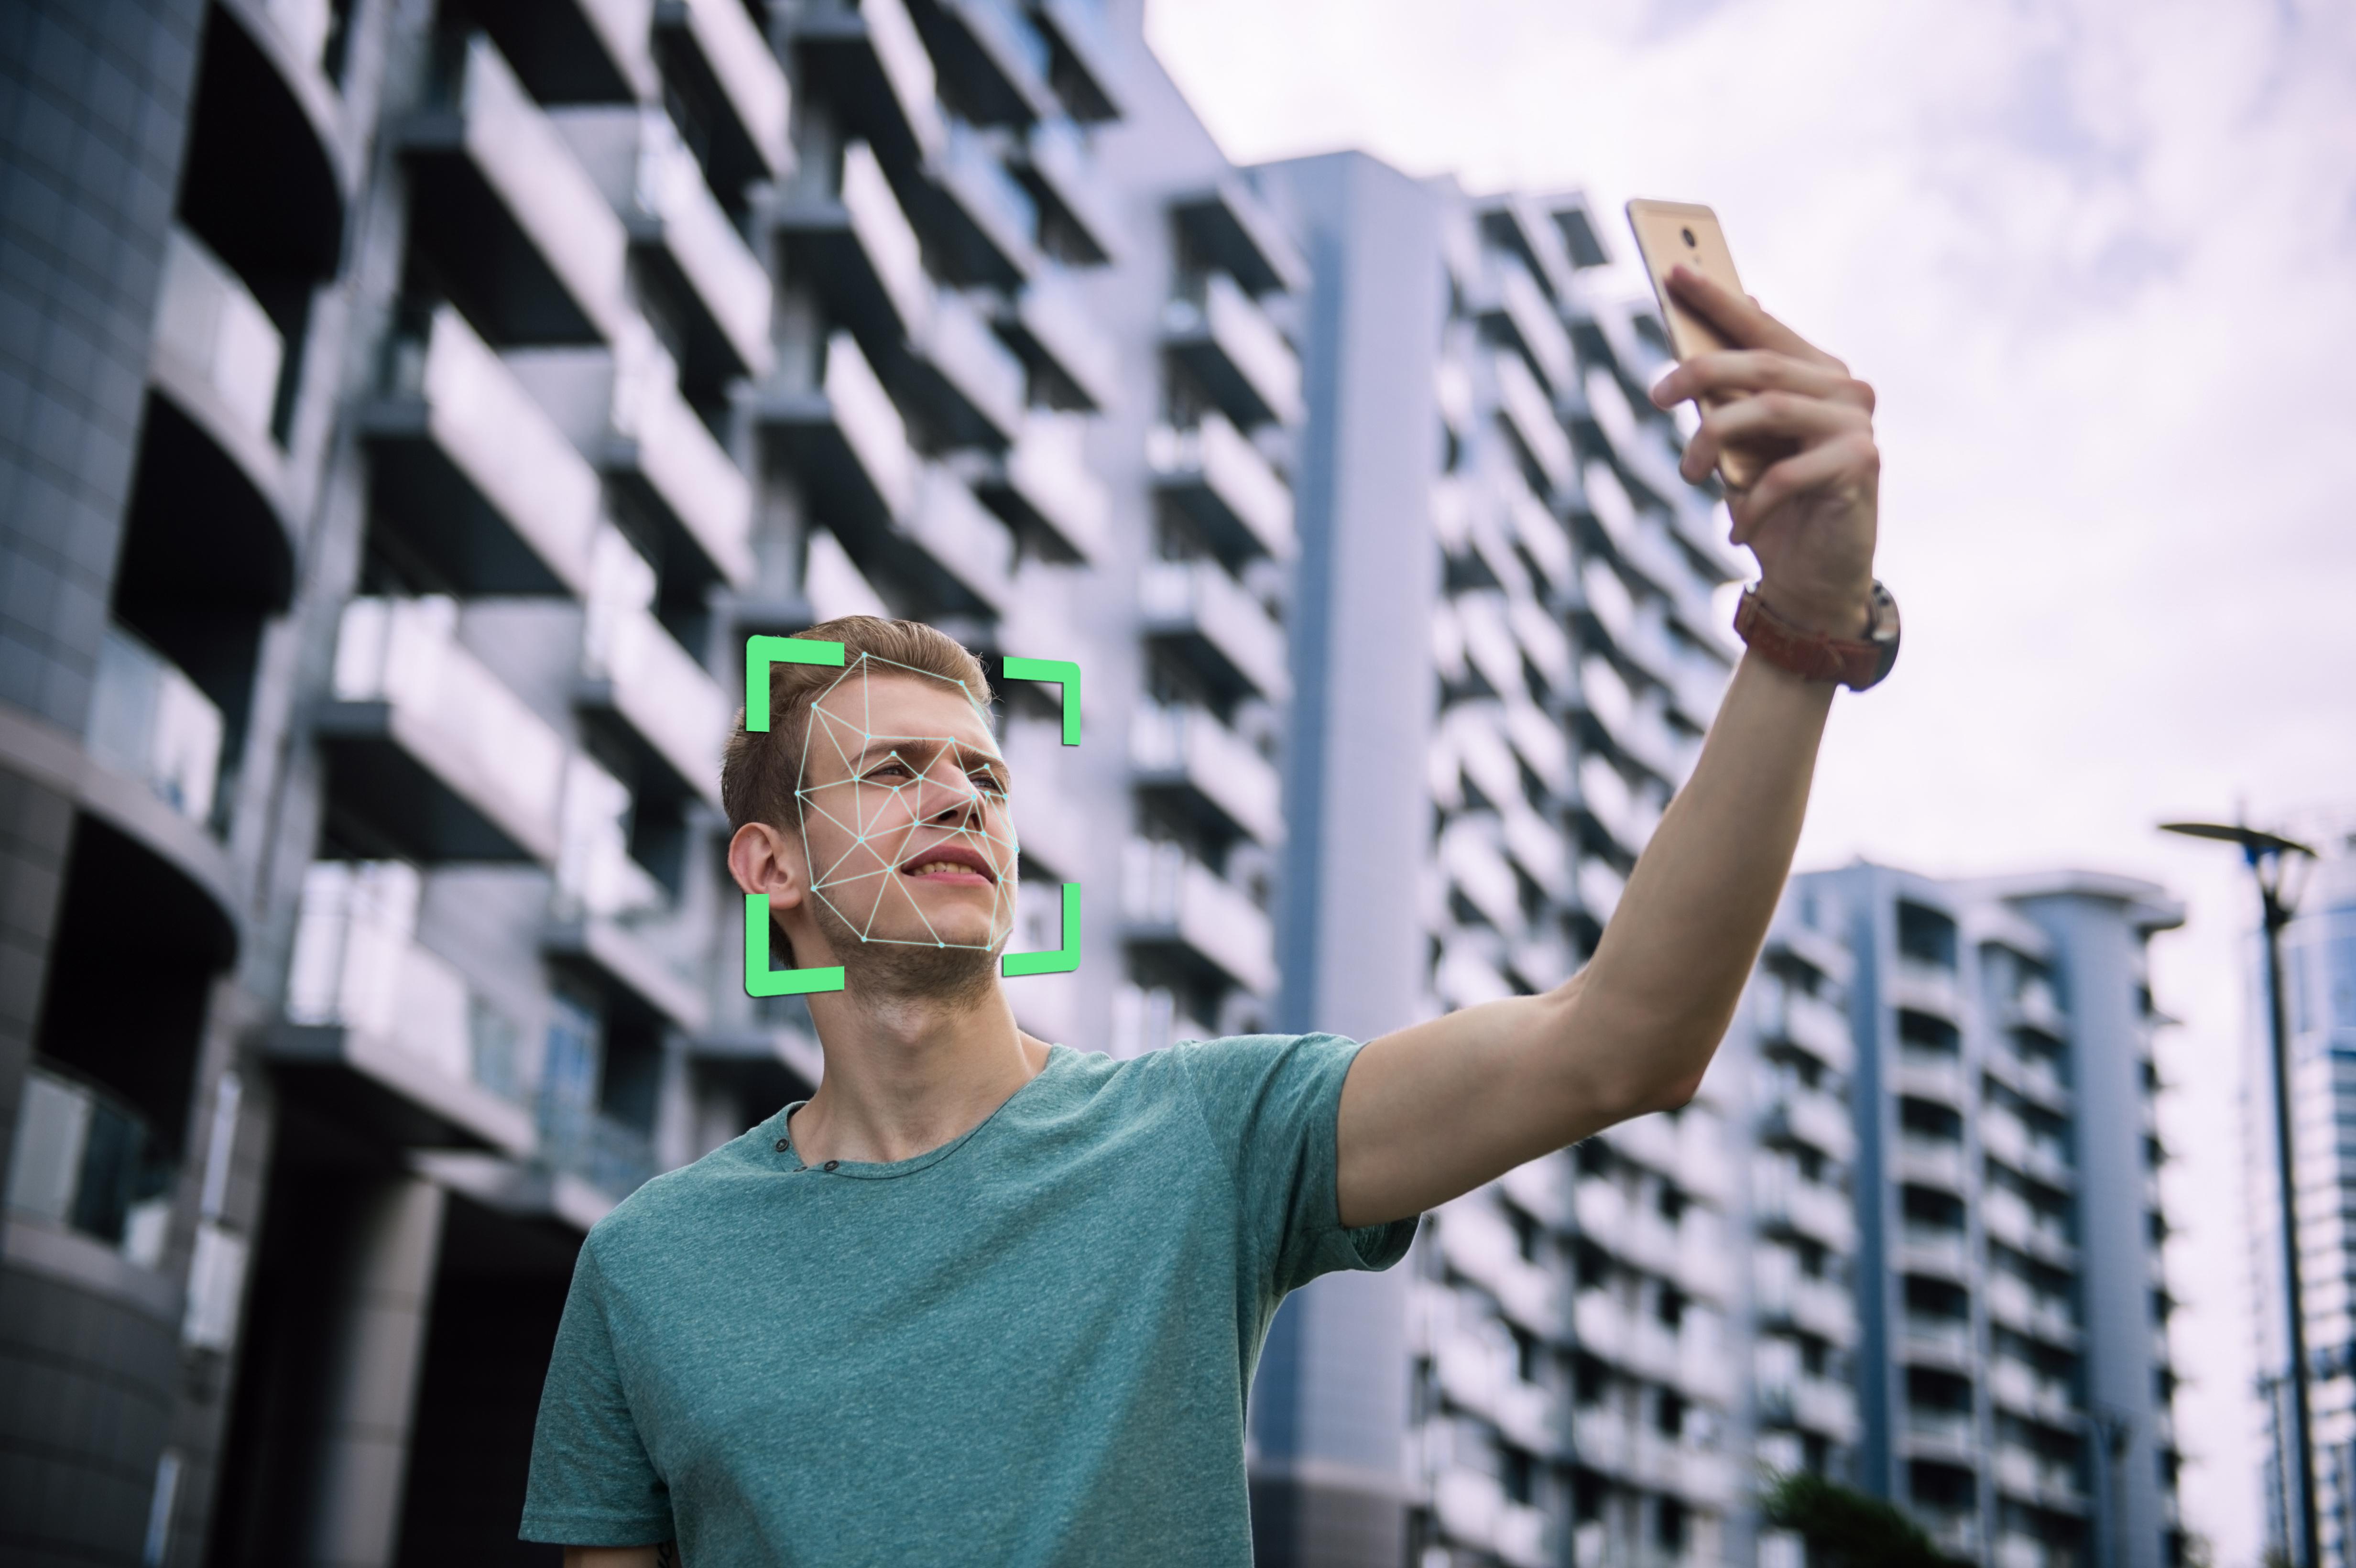 Should we fear facial recognition?